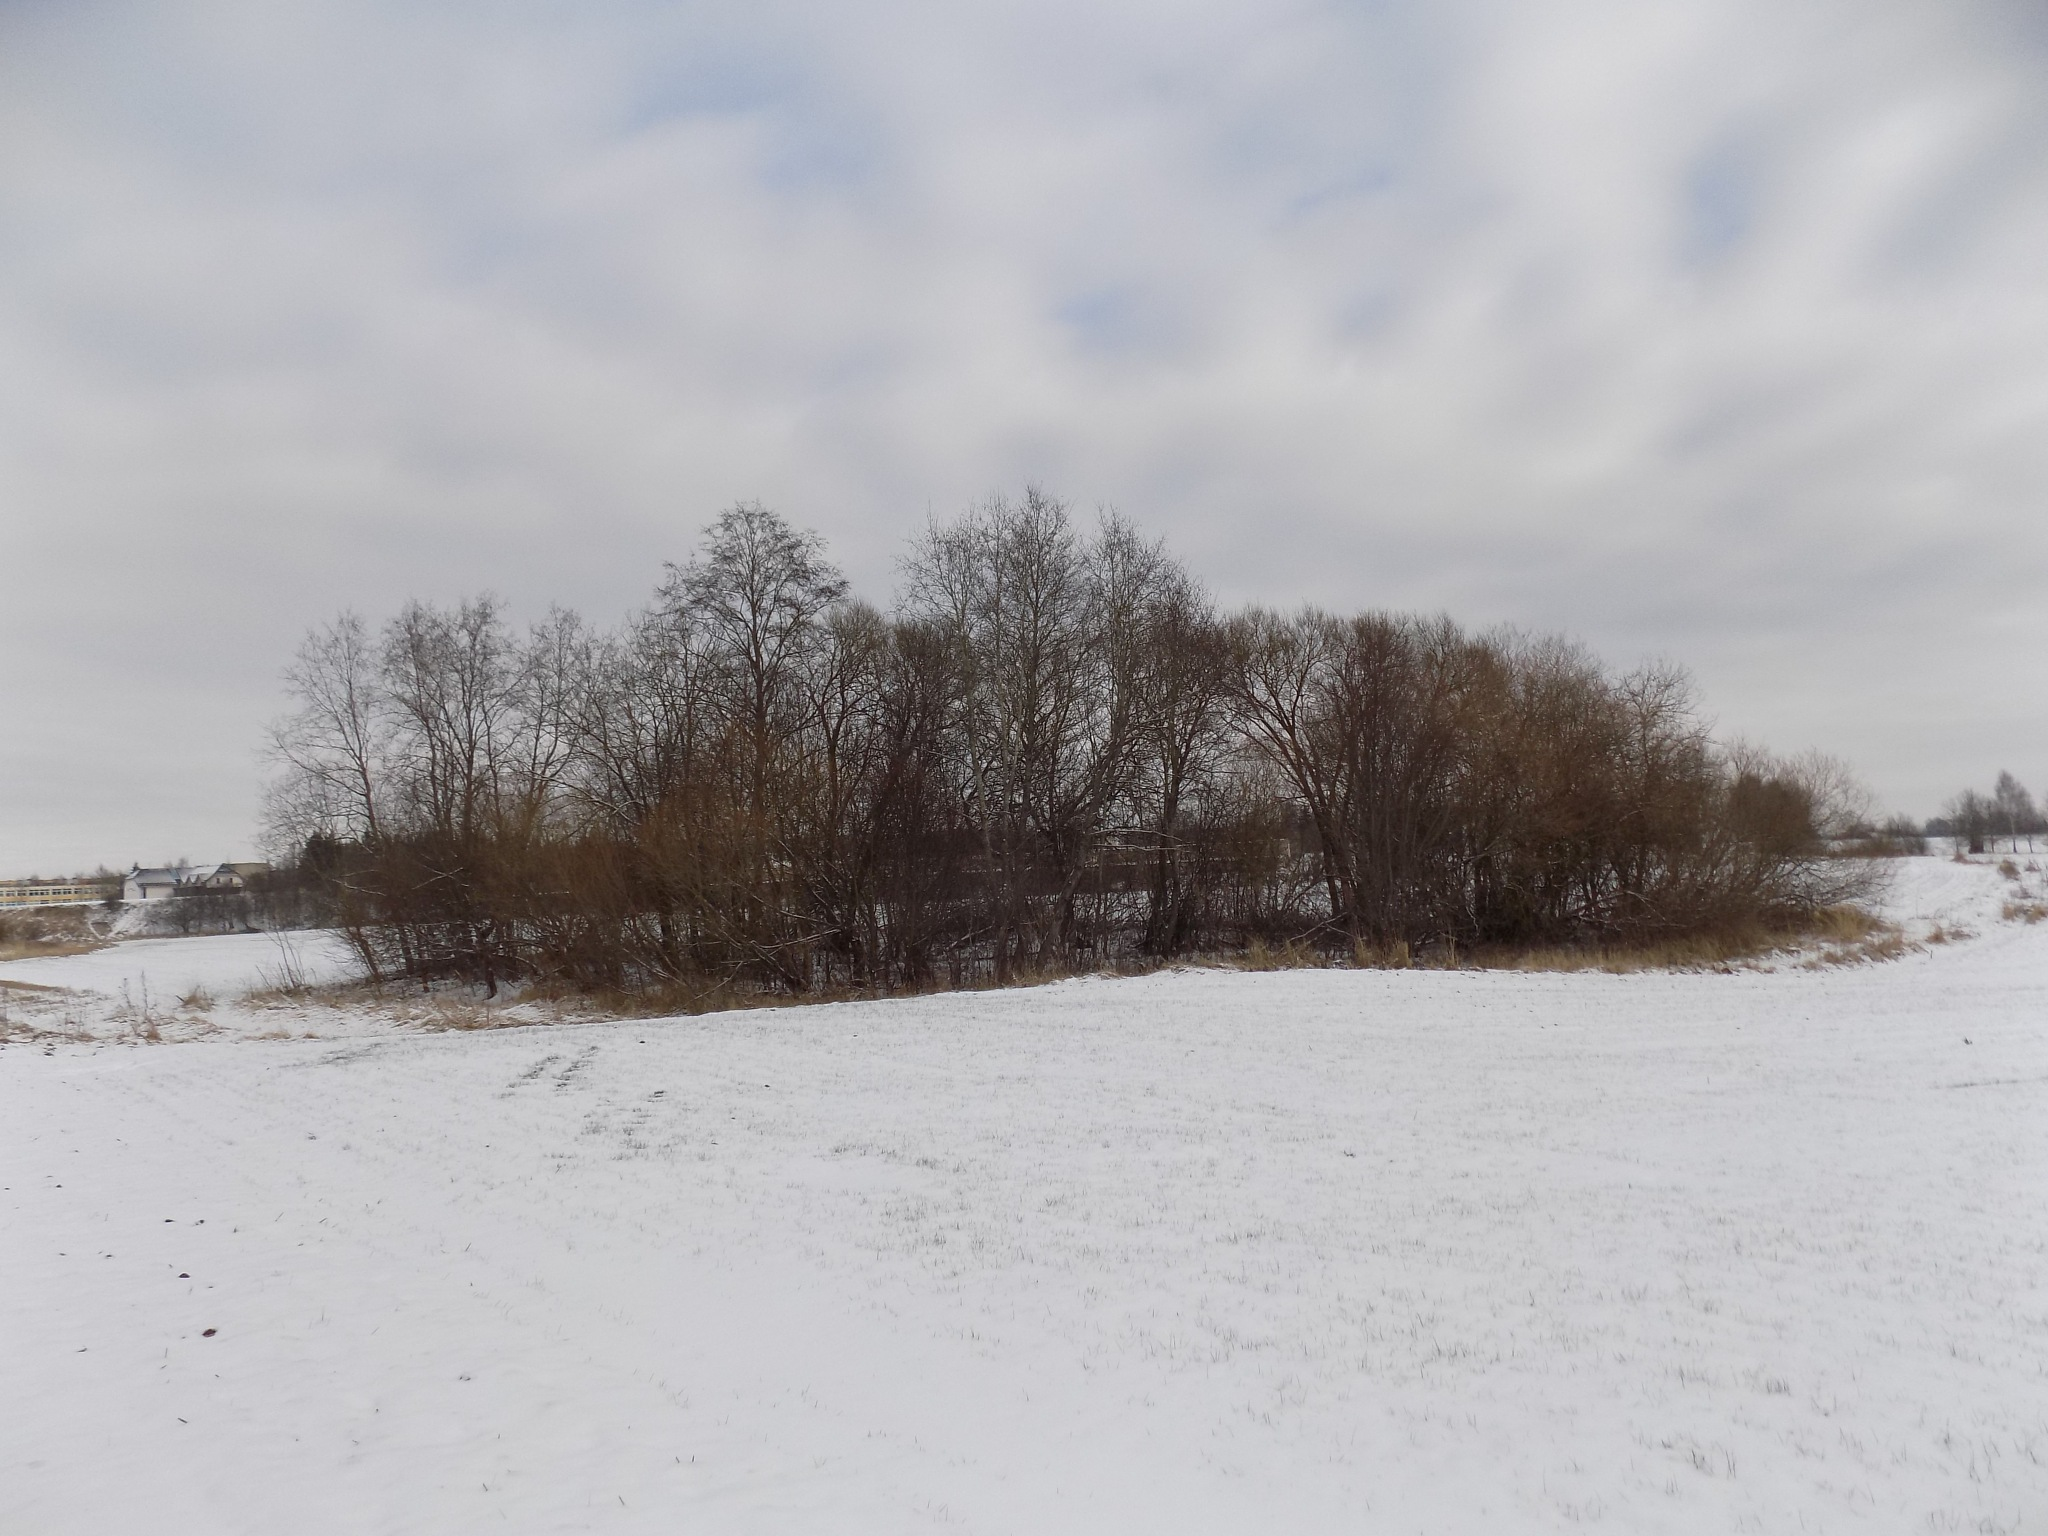 Winter landscape by uzkuraitiene62